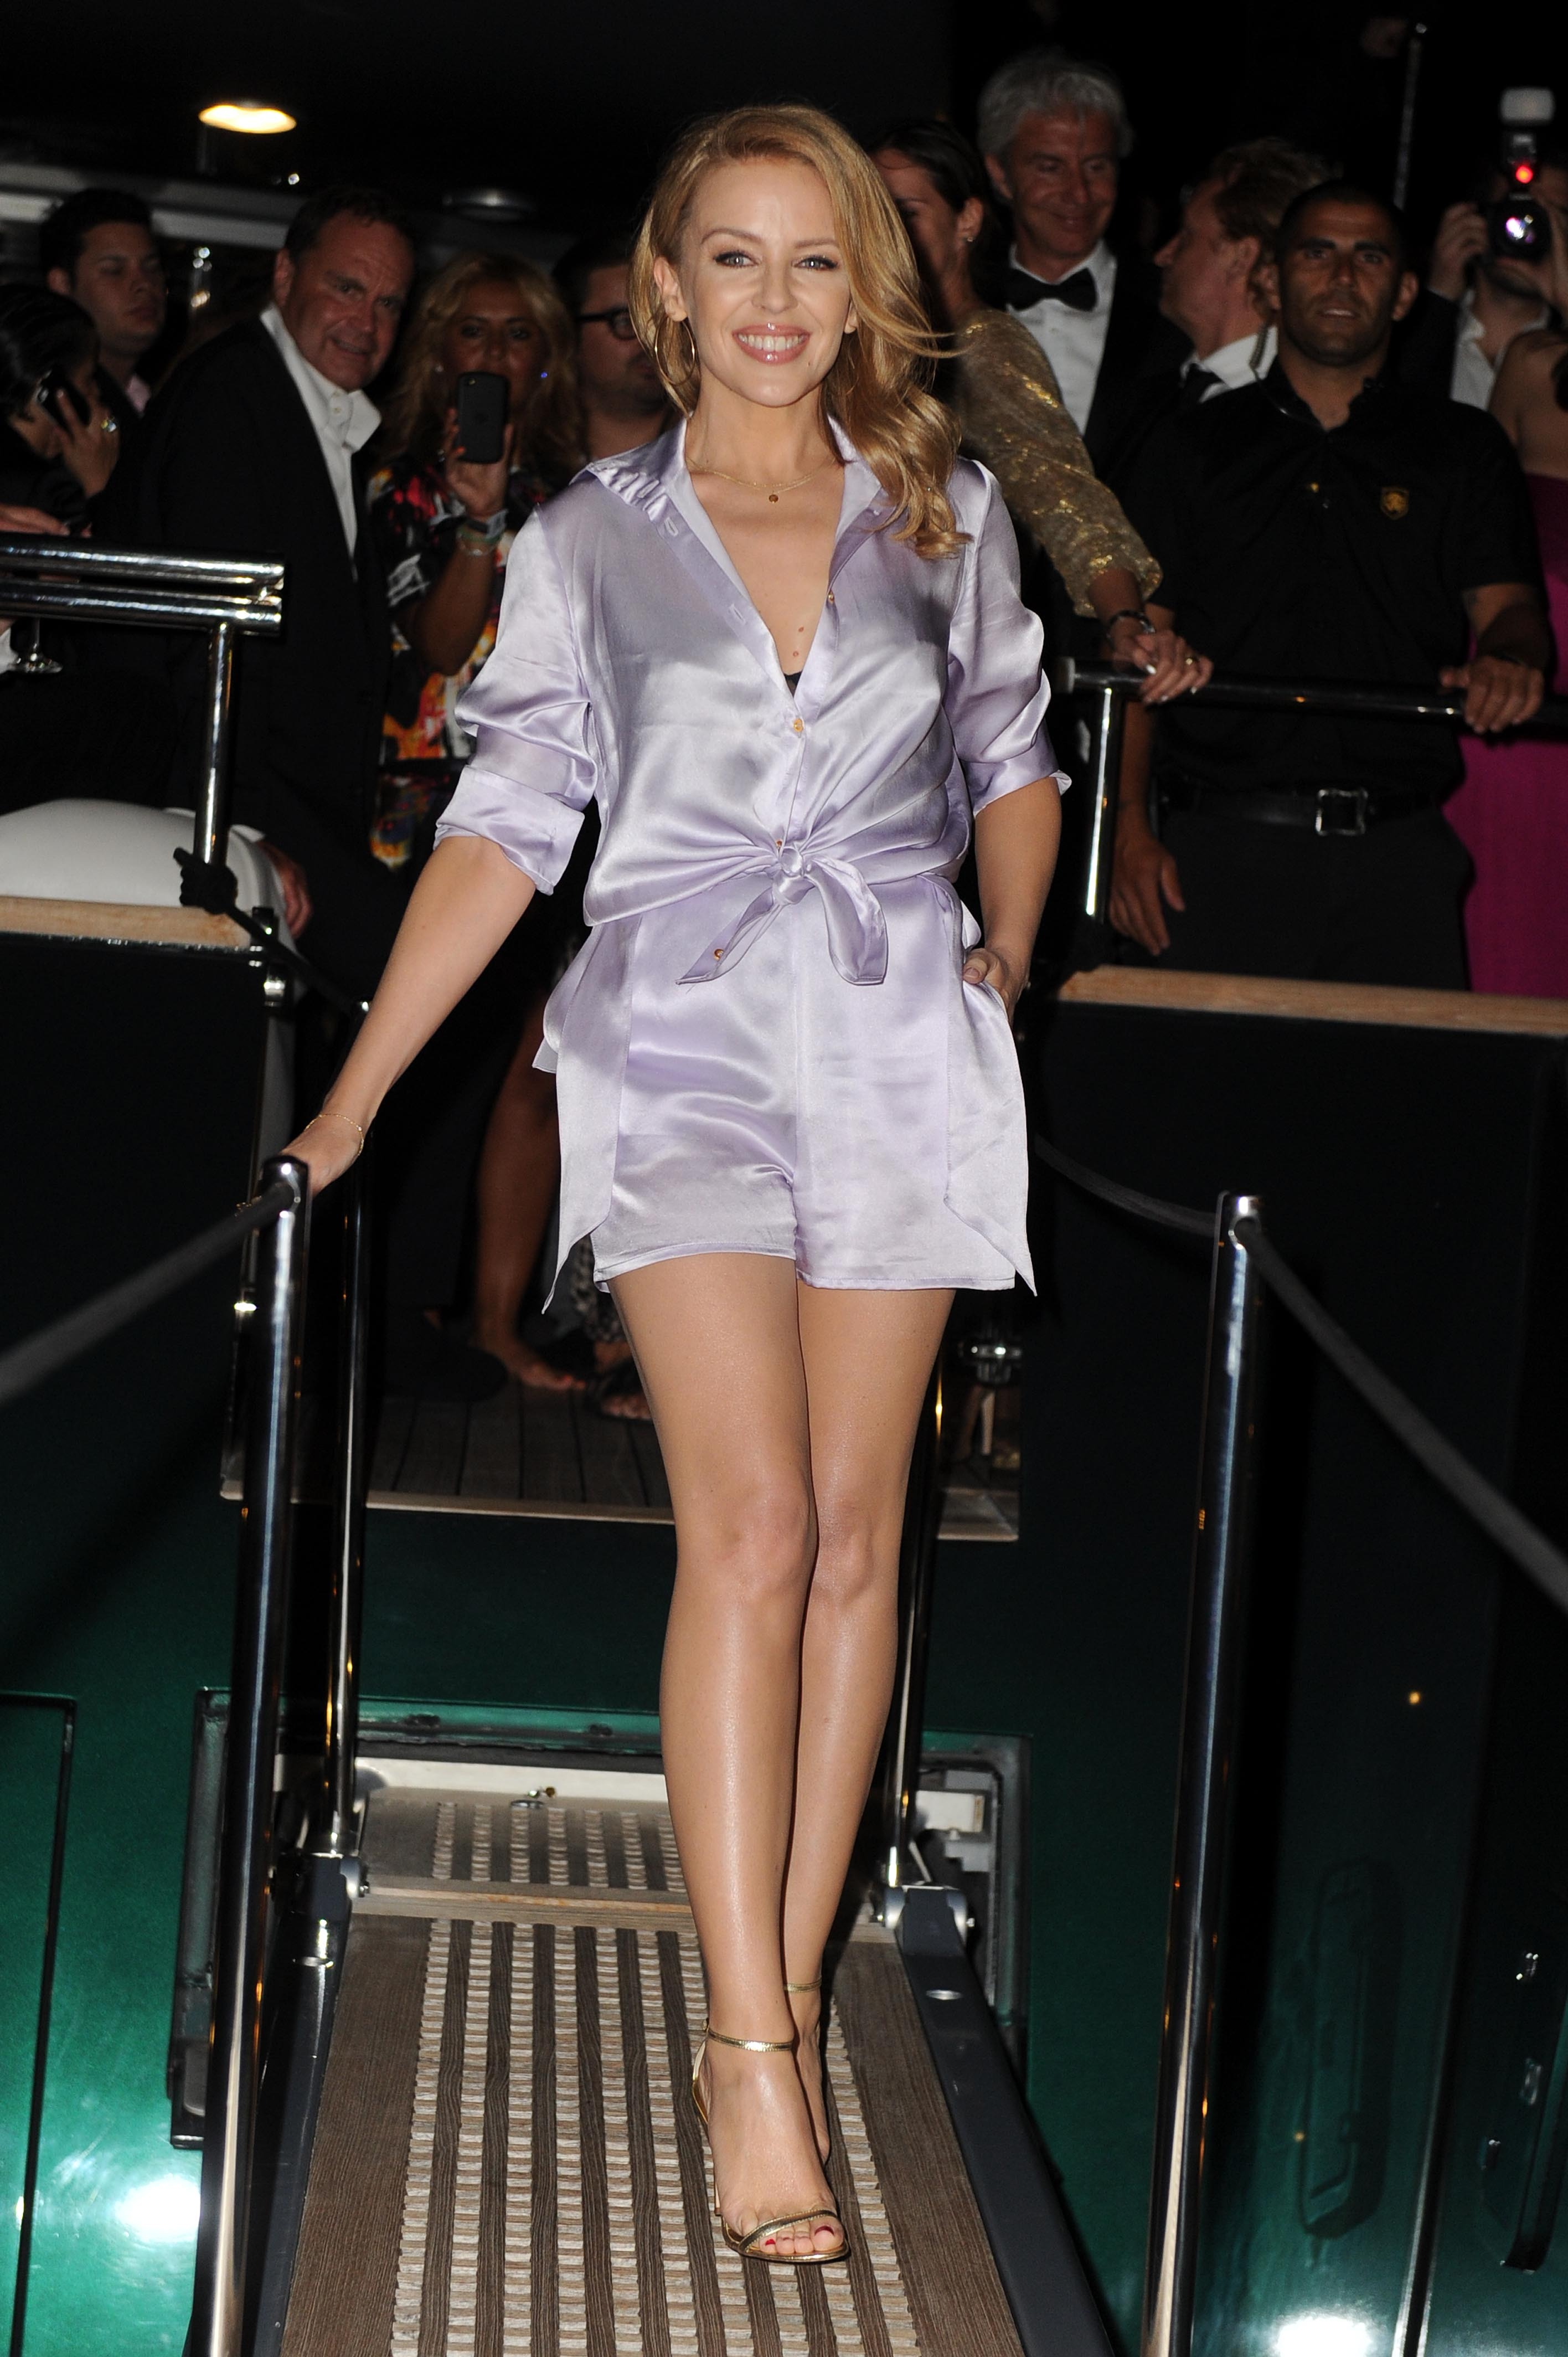 Kylie X Jordyn Collection Gloss: 2832 X 4256 Id. 1337130